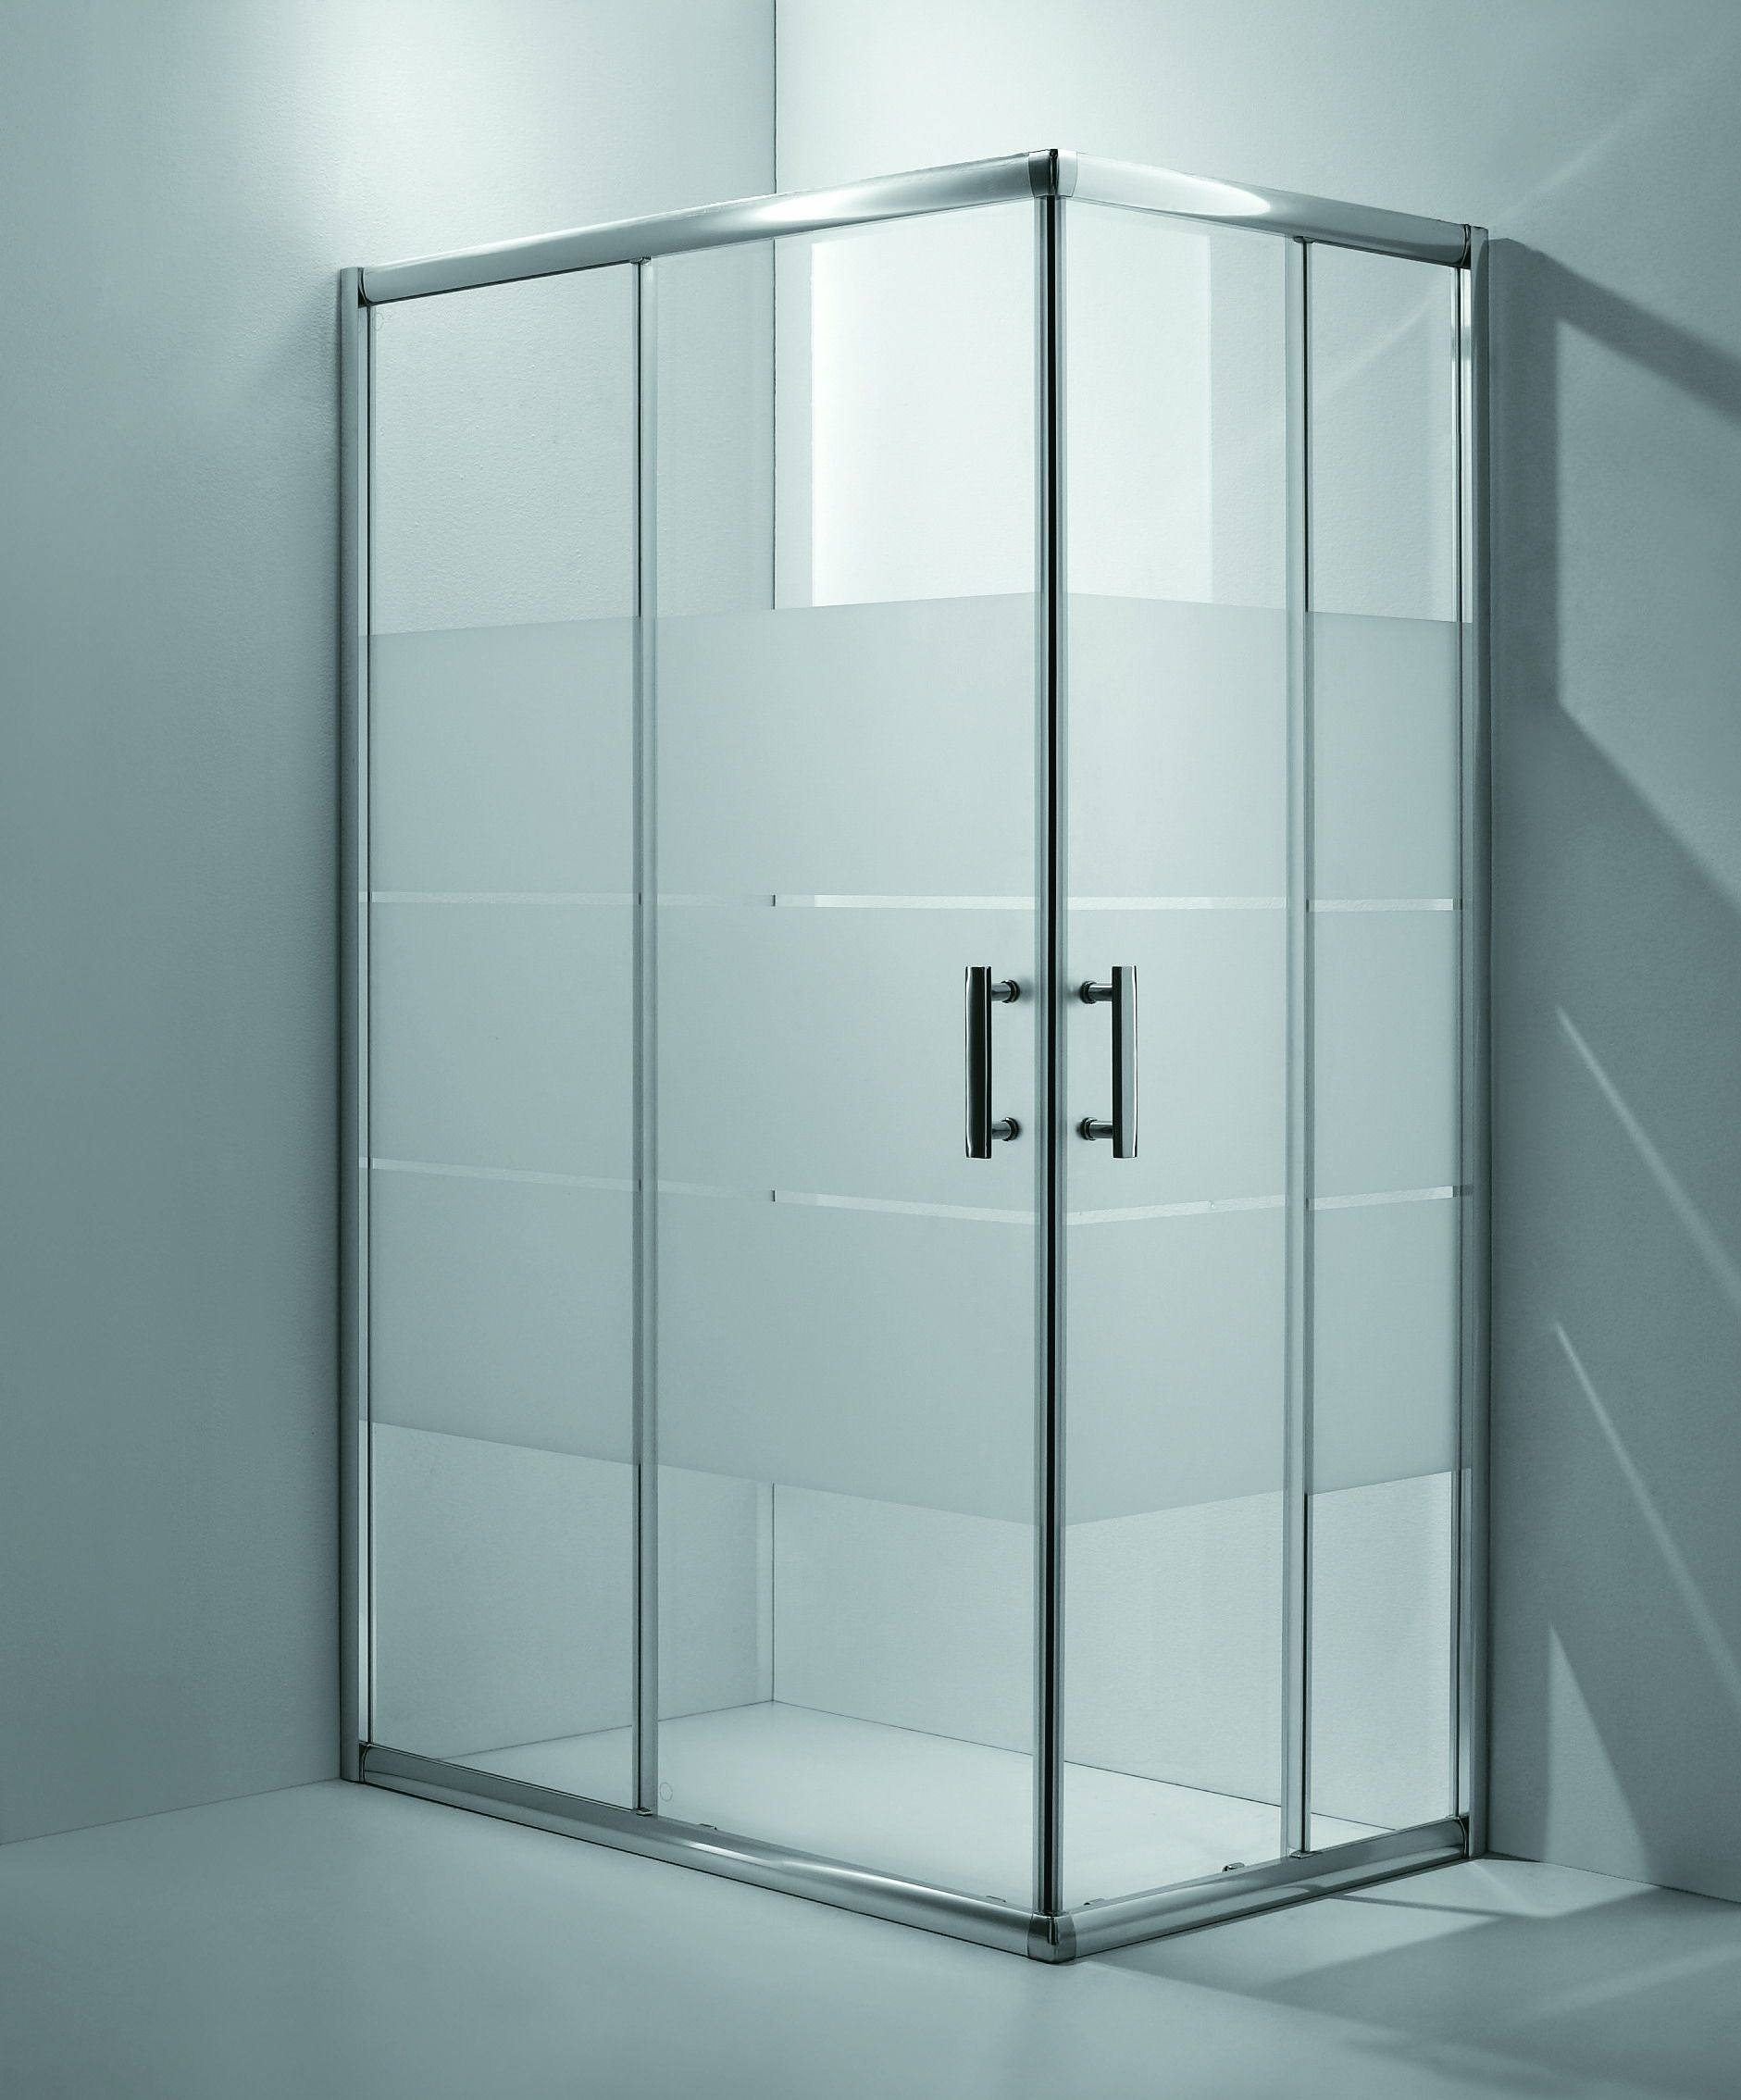 Mampara de ducha segunda mano fabulous mamparas de ducha - Mamparas de ducha de segunda mano ...